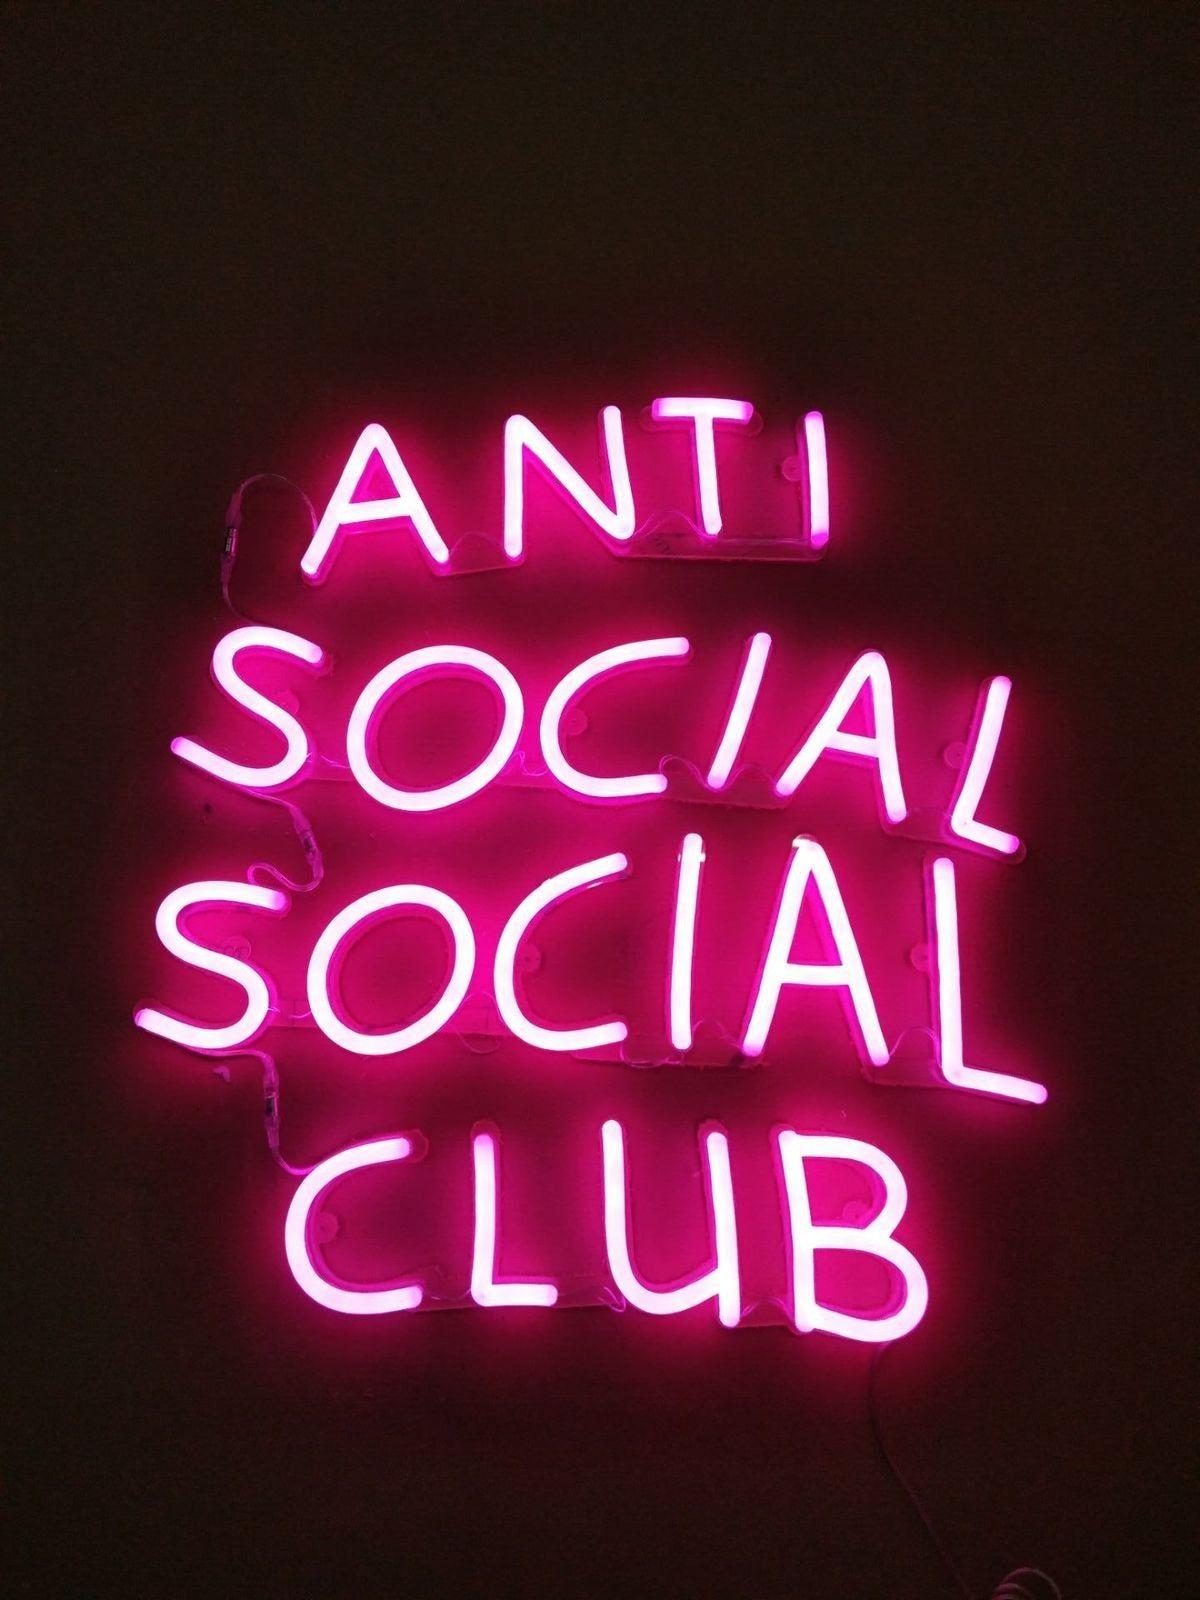 Pin by Brooke Whitt on antisocial social club Neon